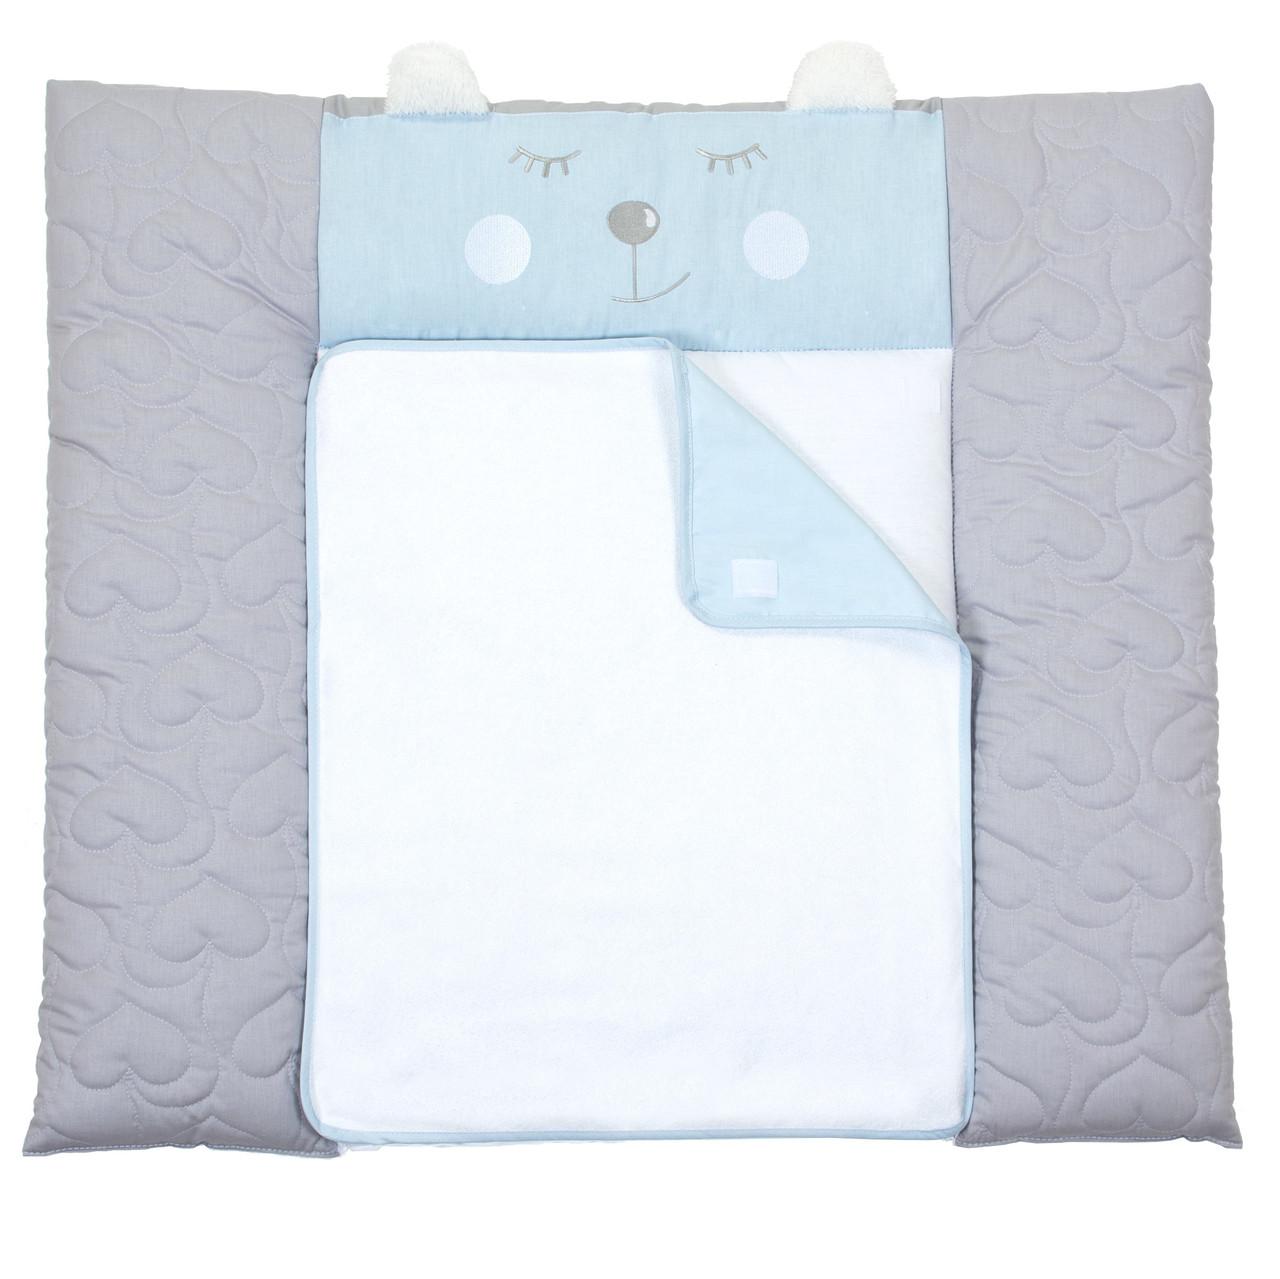 Пеленальный матрас для новорожденных тканевый Veres Lovely boy